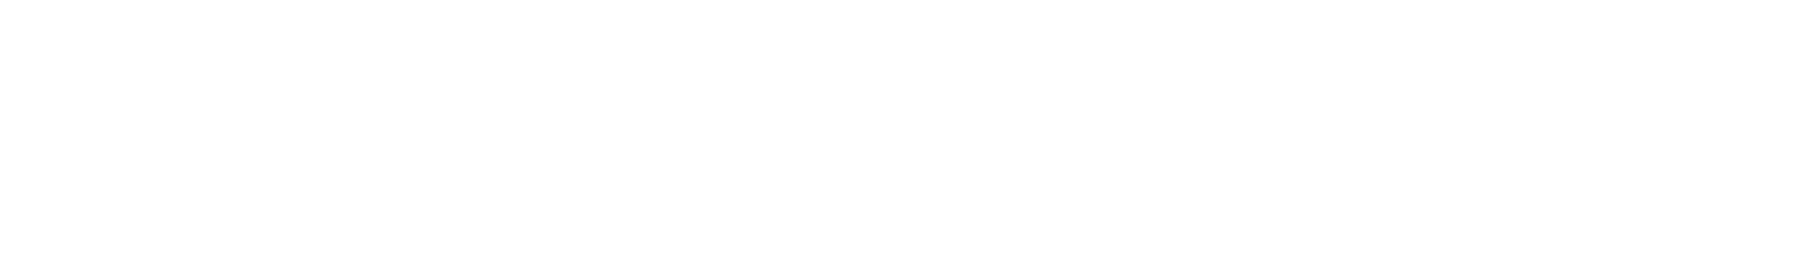 common drum loop 135 bpm